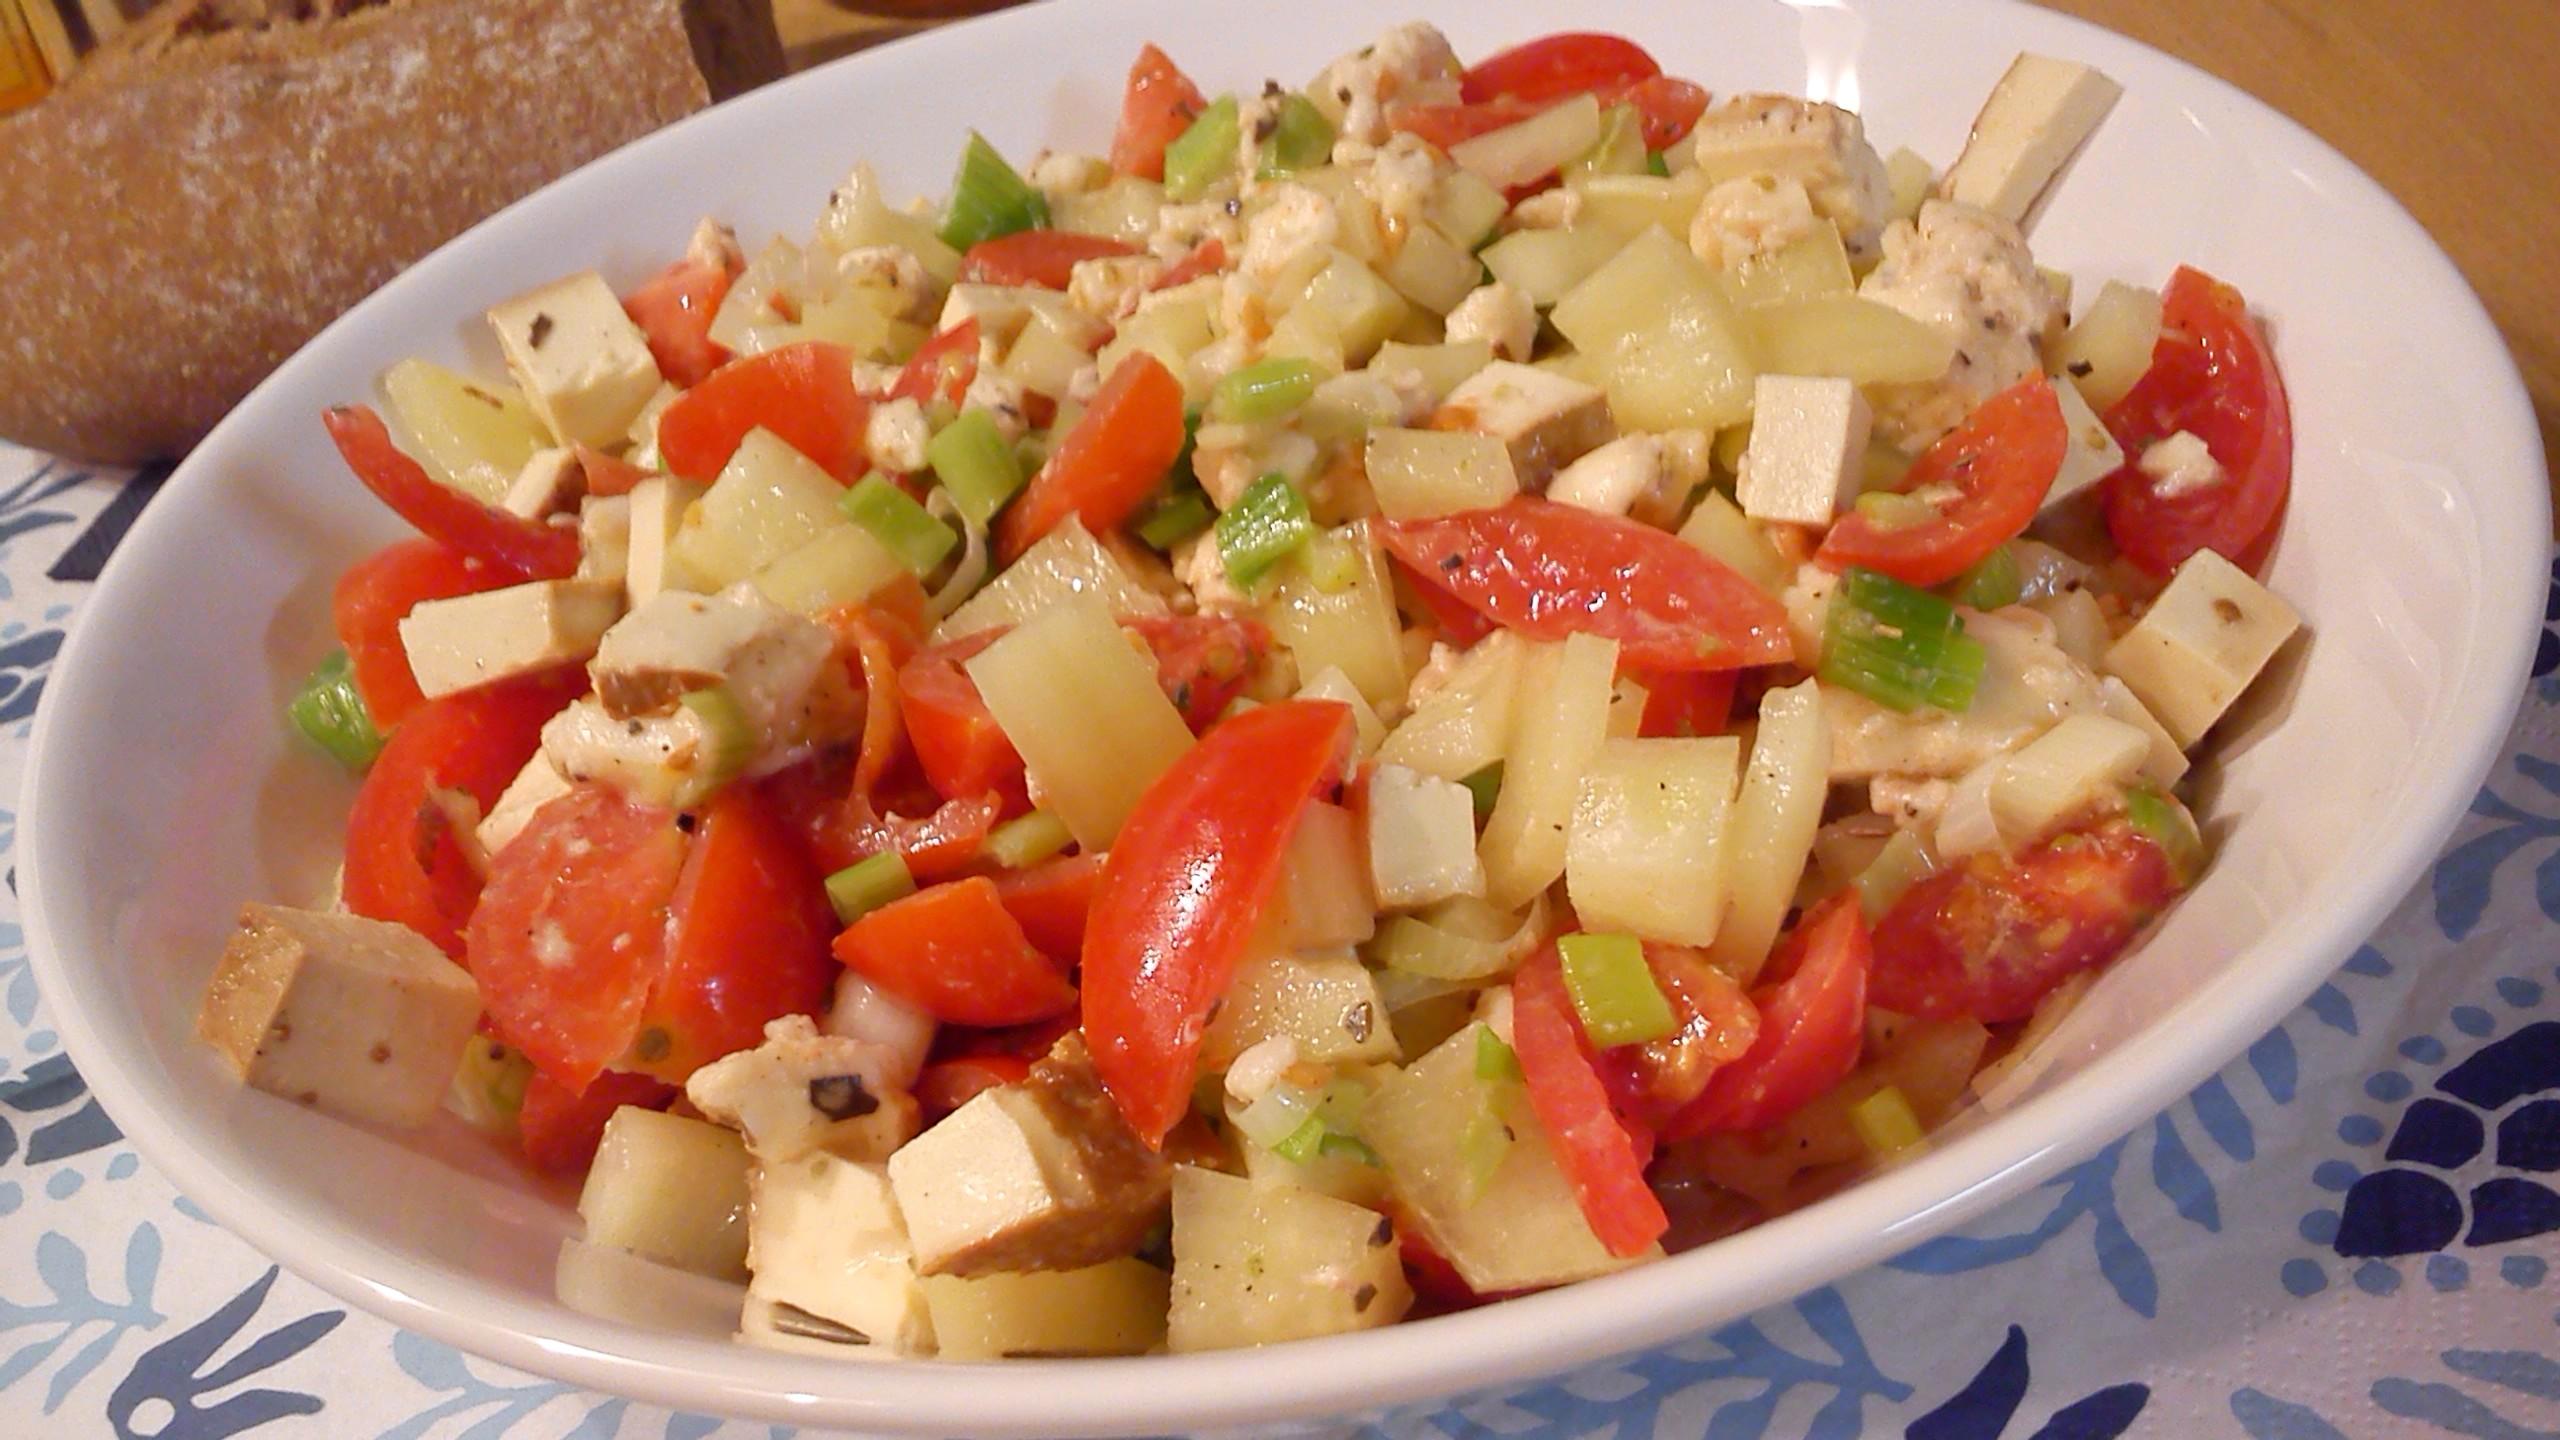 Zeleninový salát s tofu a mozzarellou